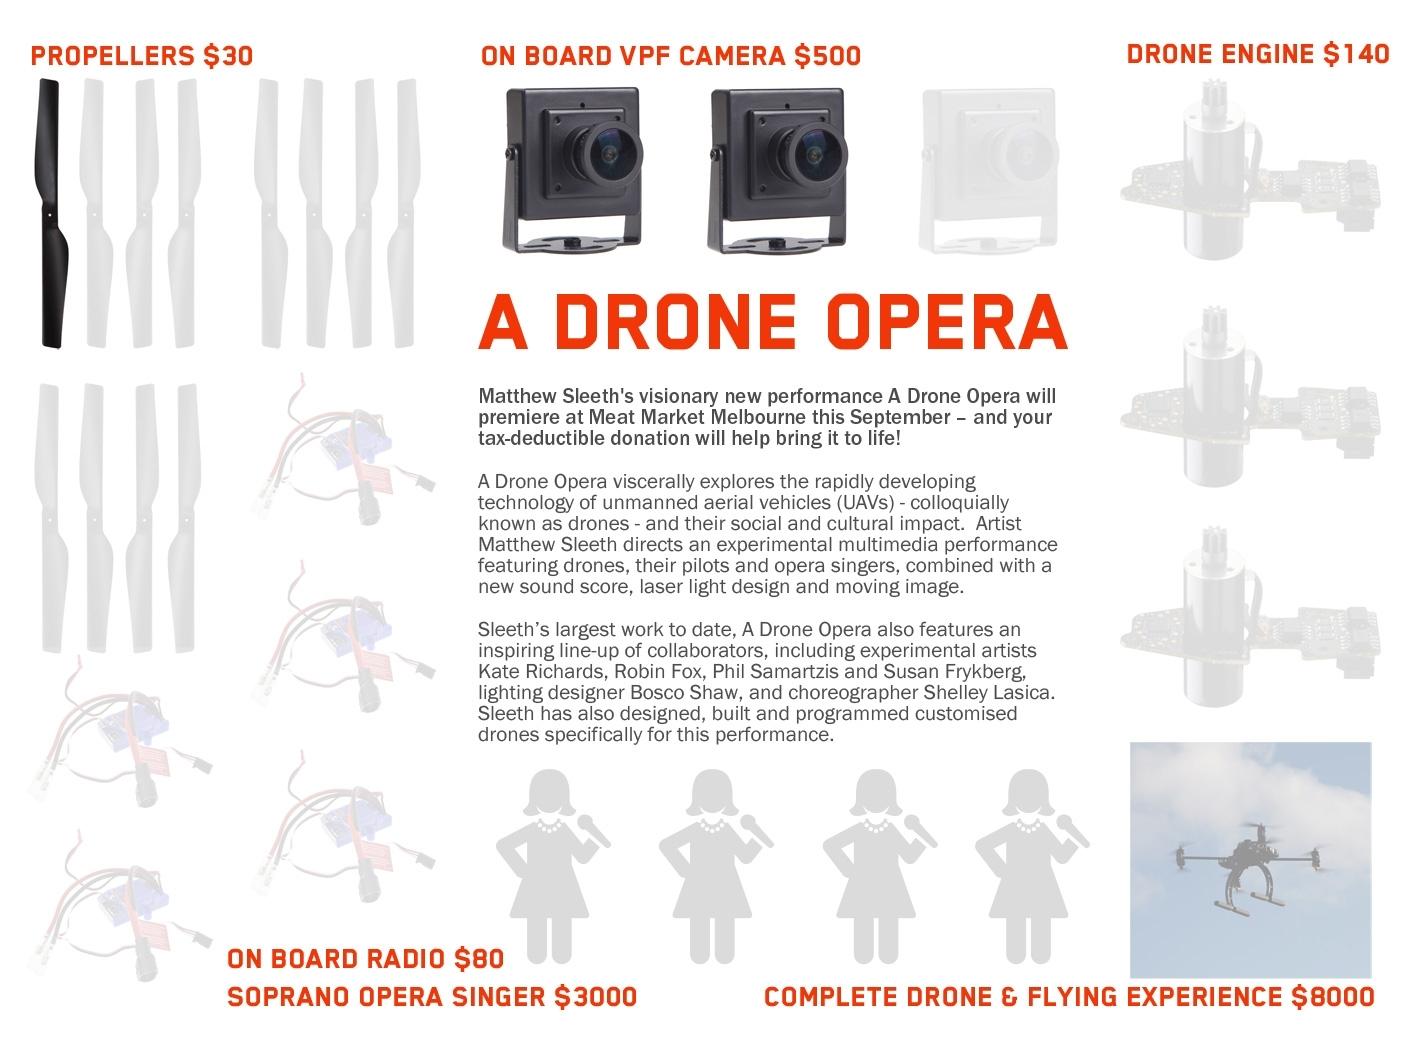 A Drone Opera image